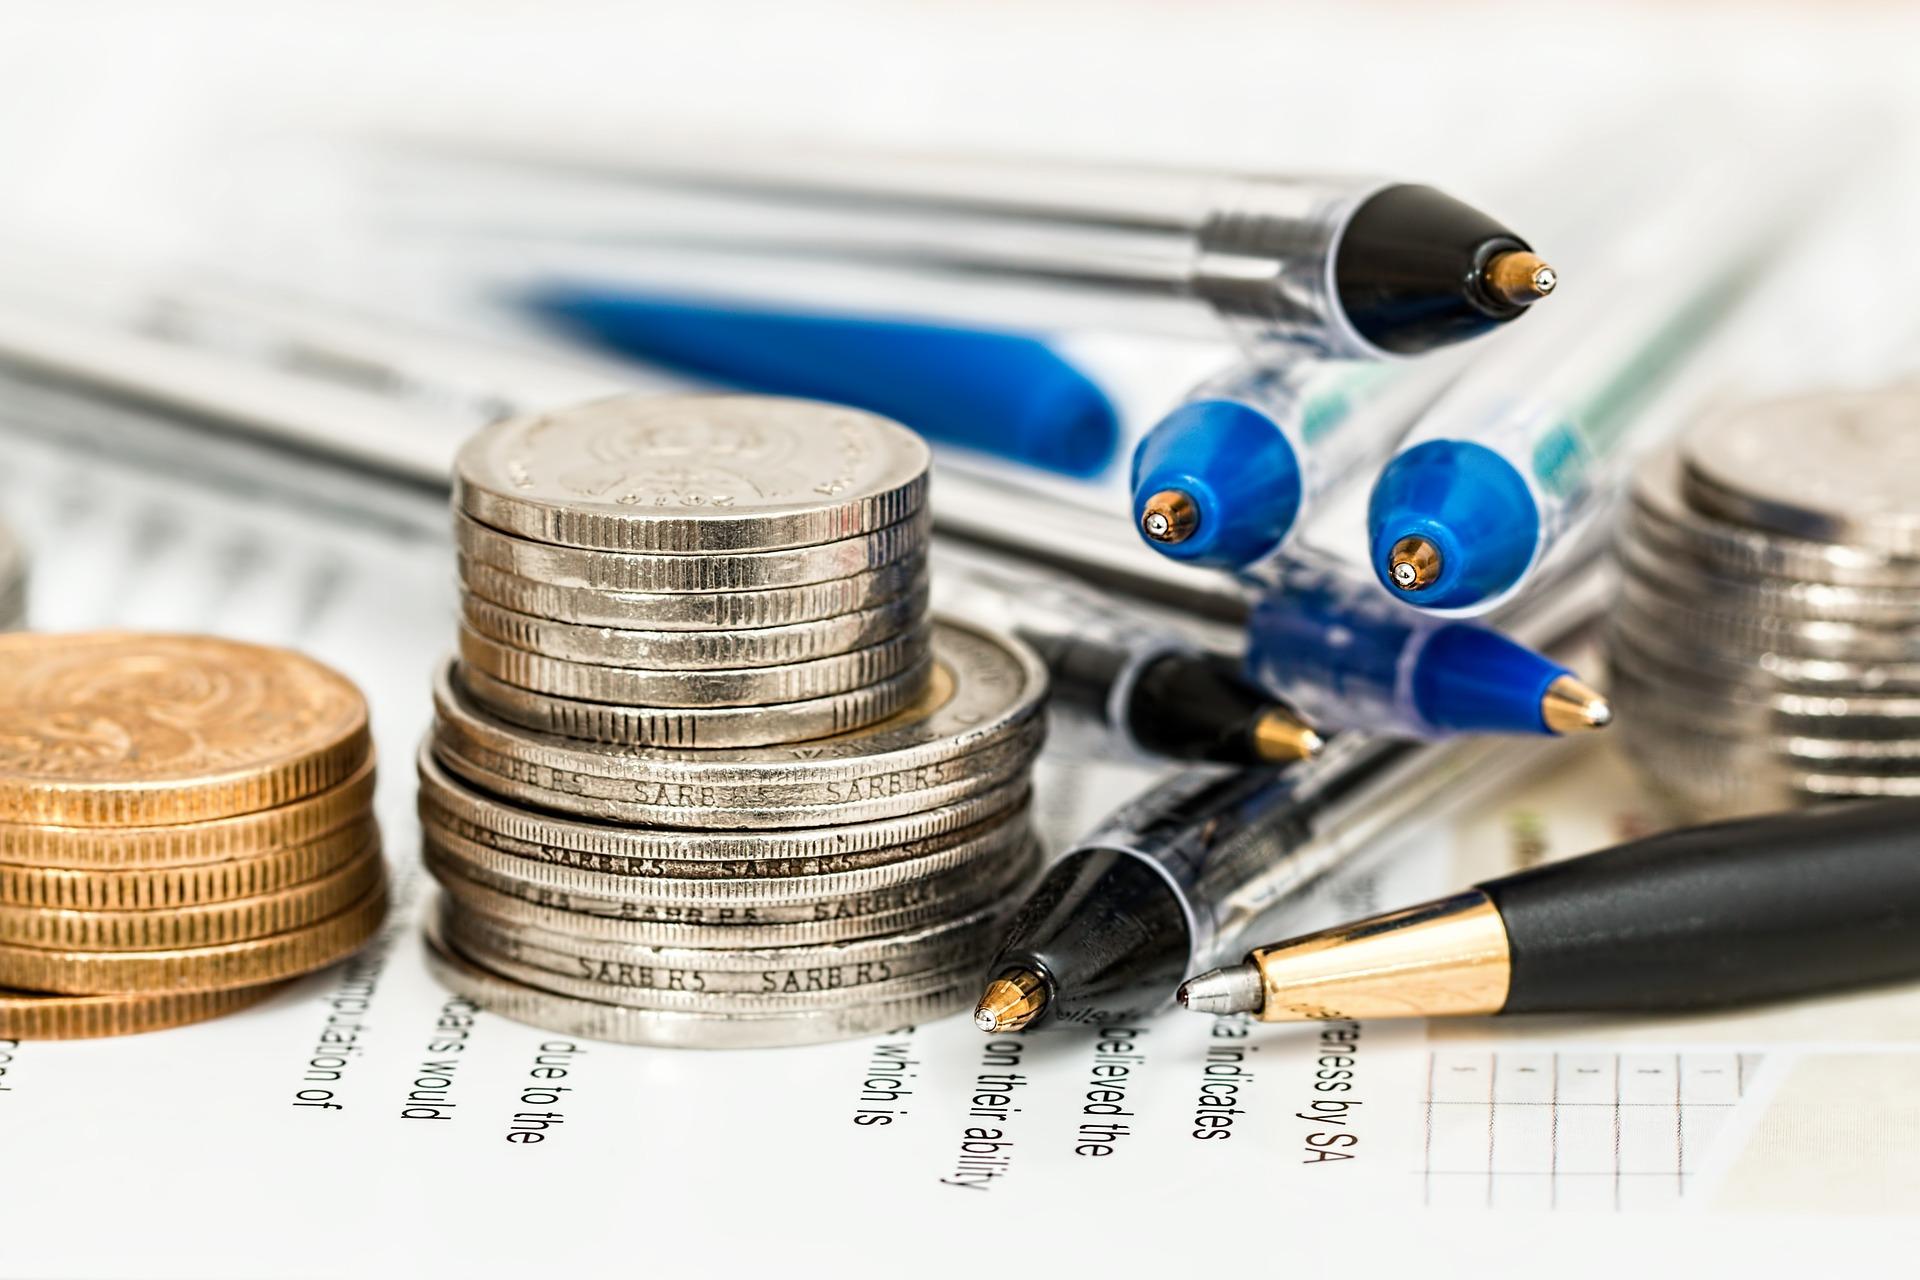 Mayoría de monedas cierran al alza, expectantes a estímulo fiscal en EU